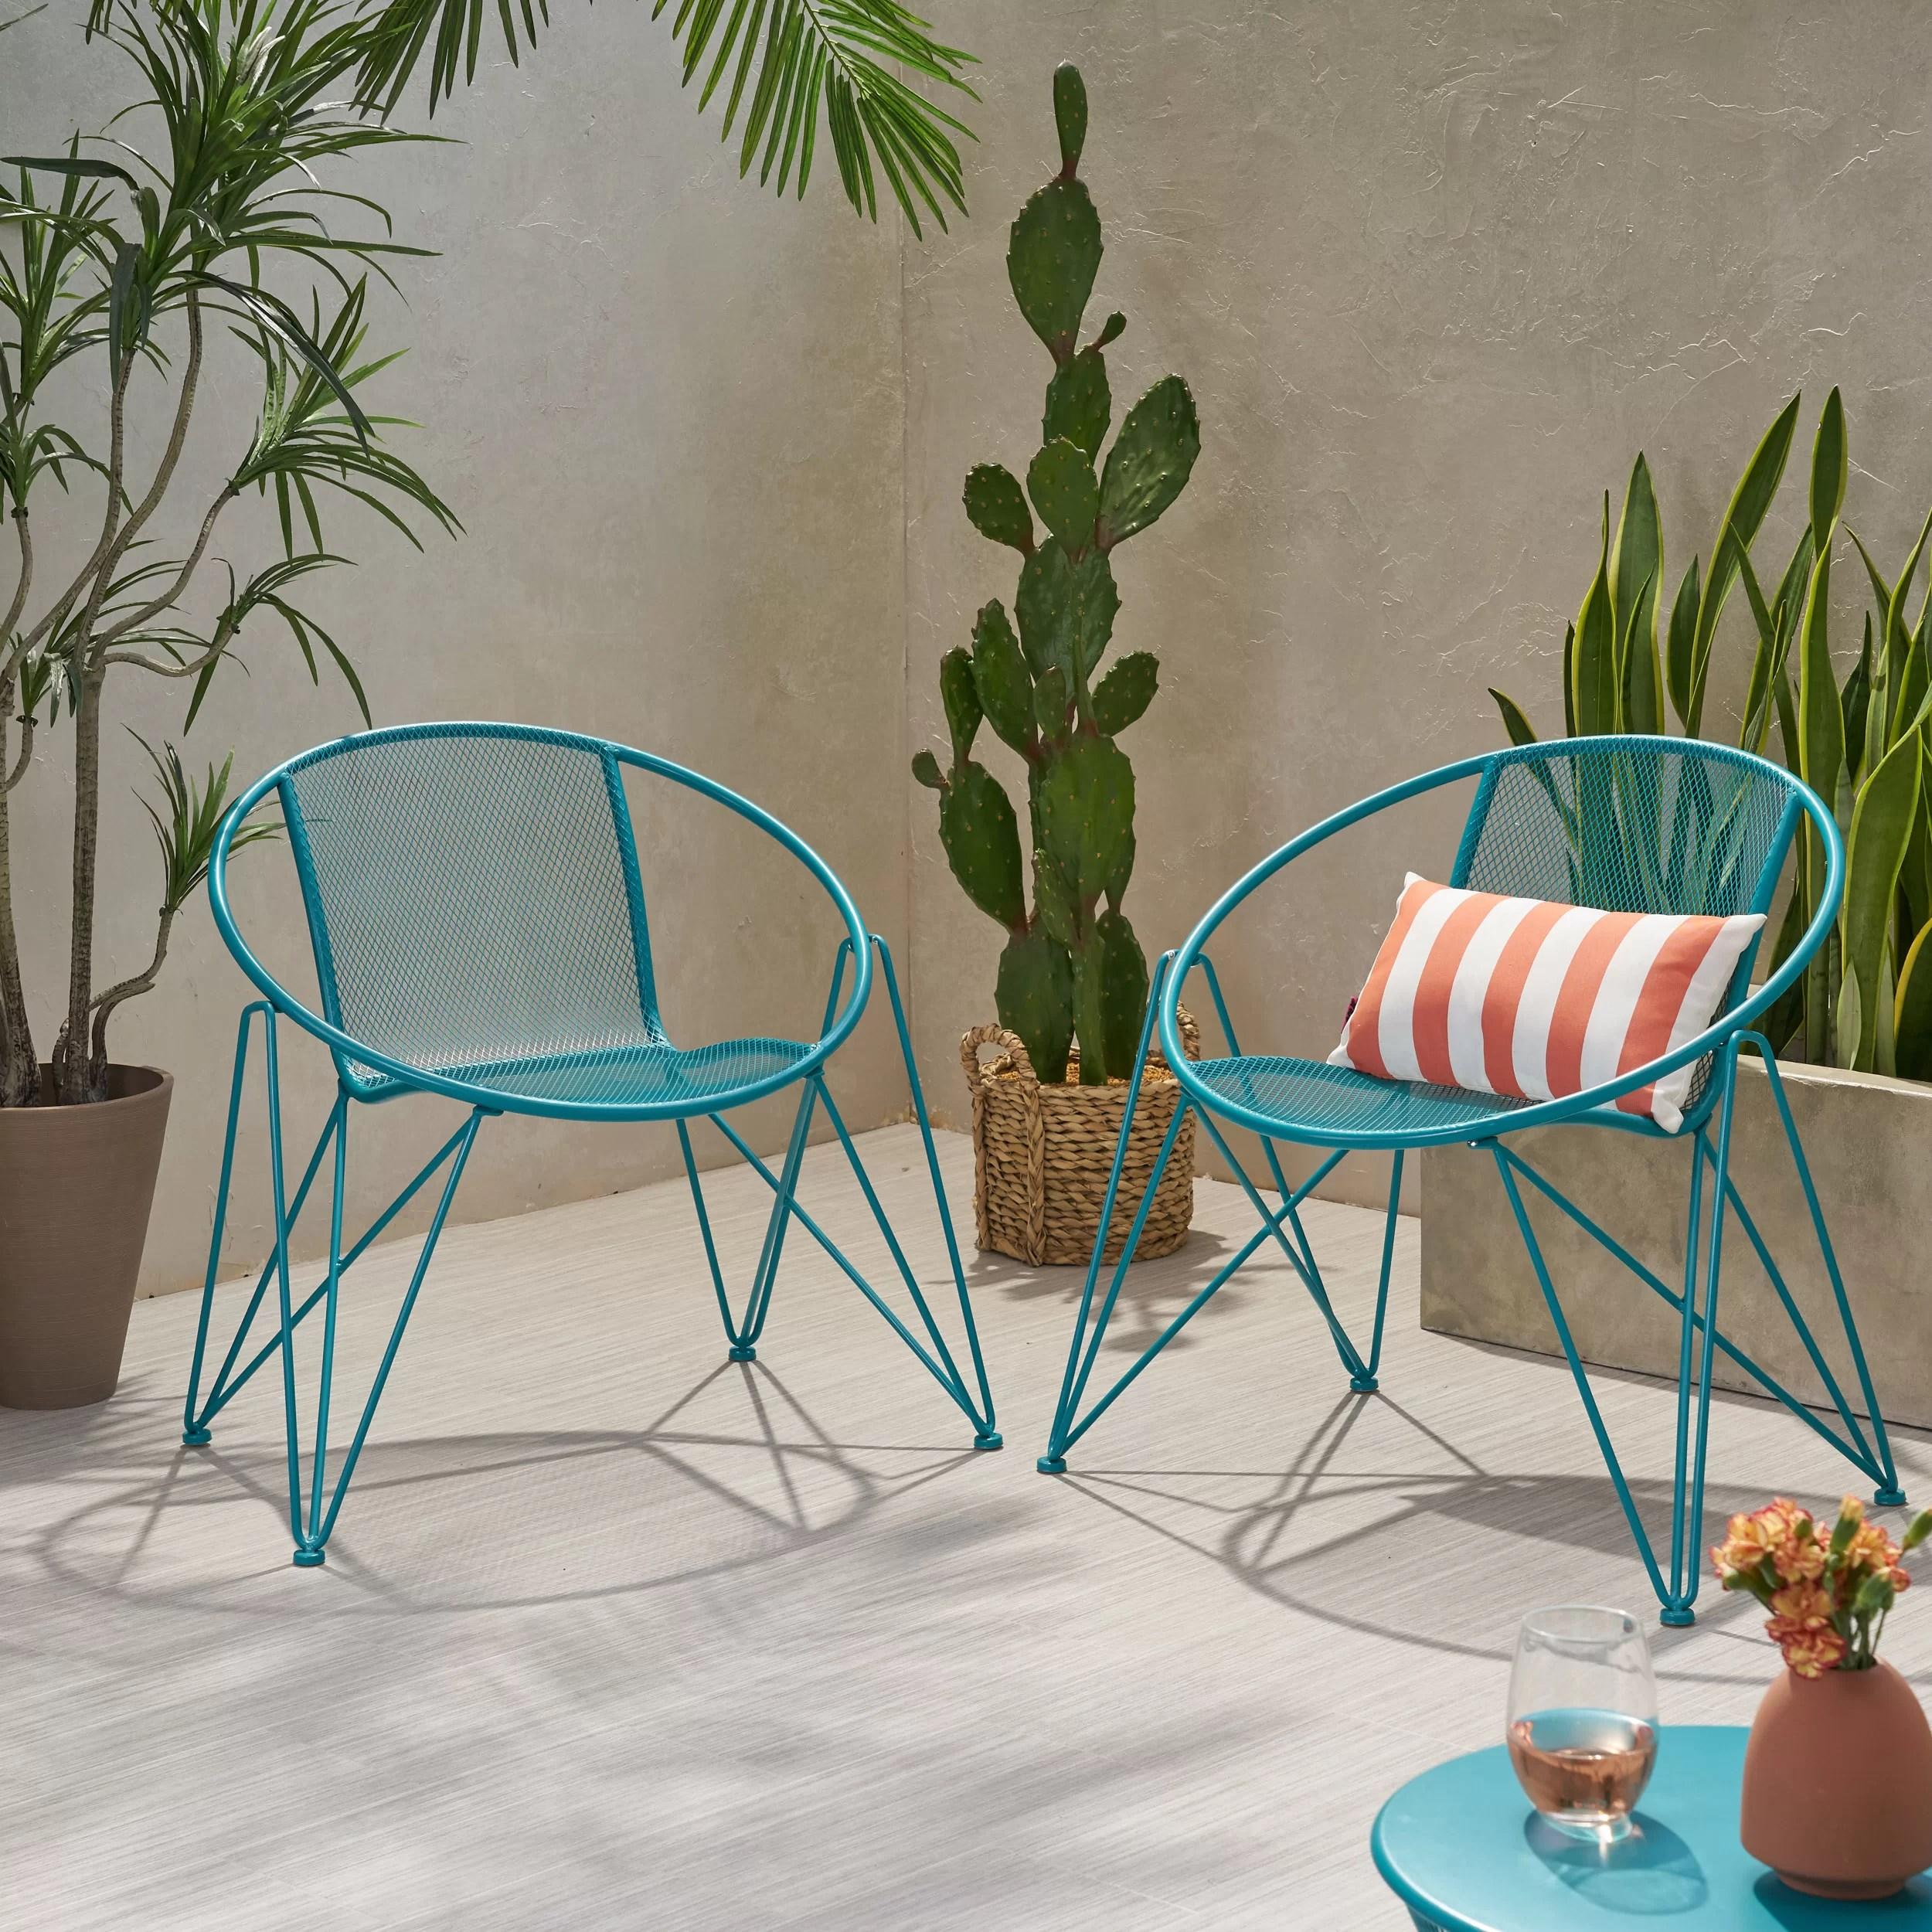 mowery modern outdoor patio chair